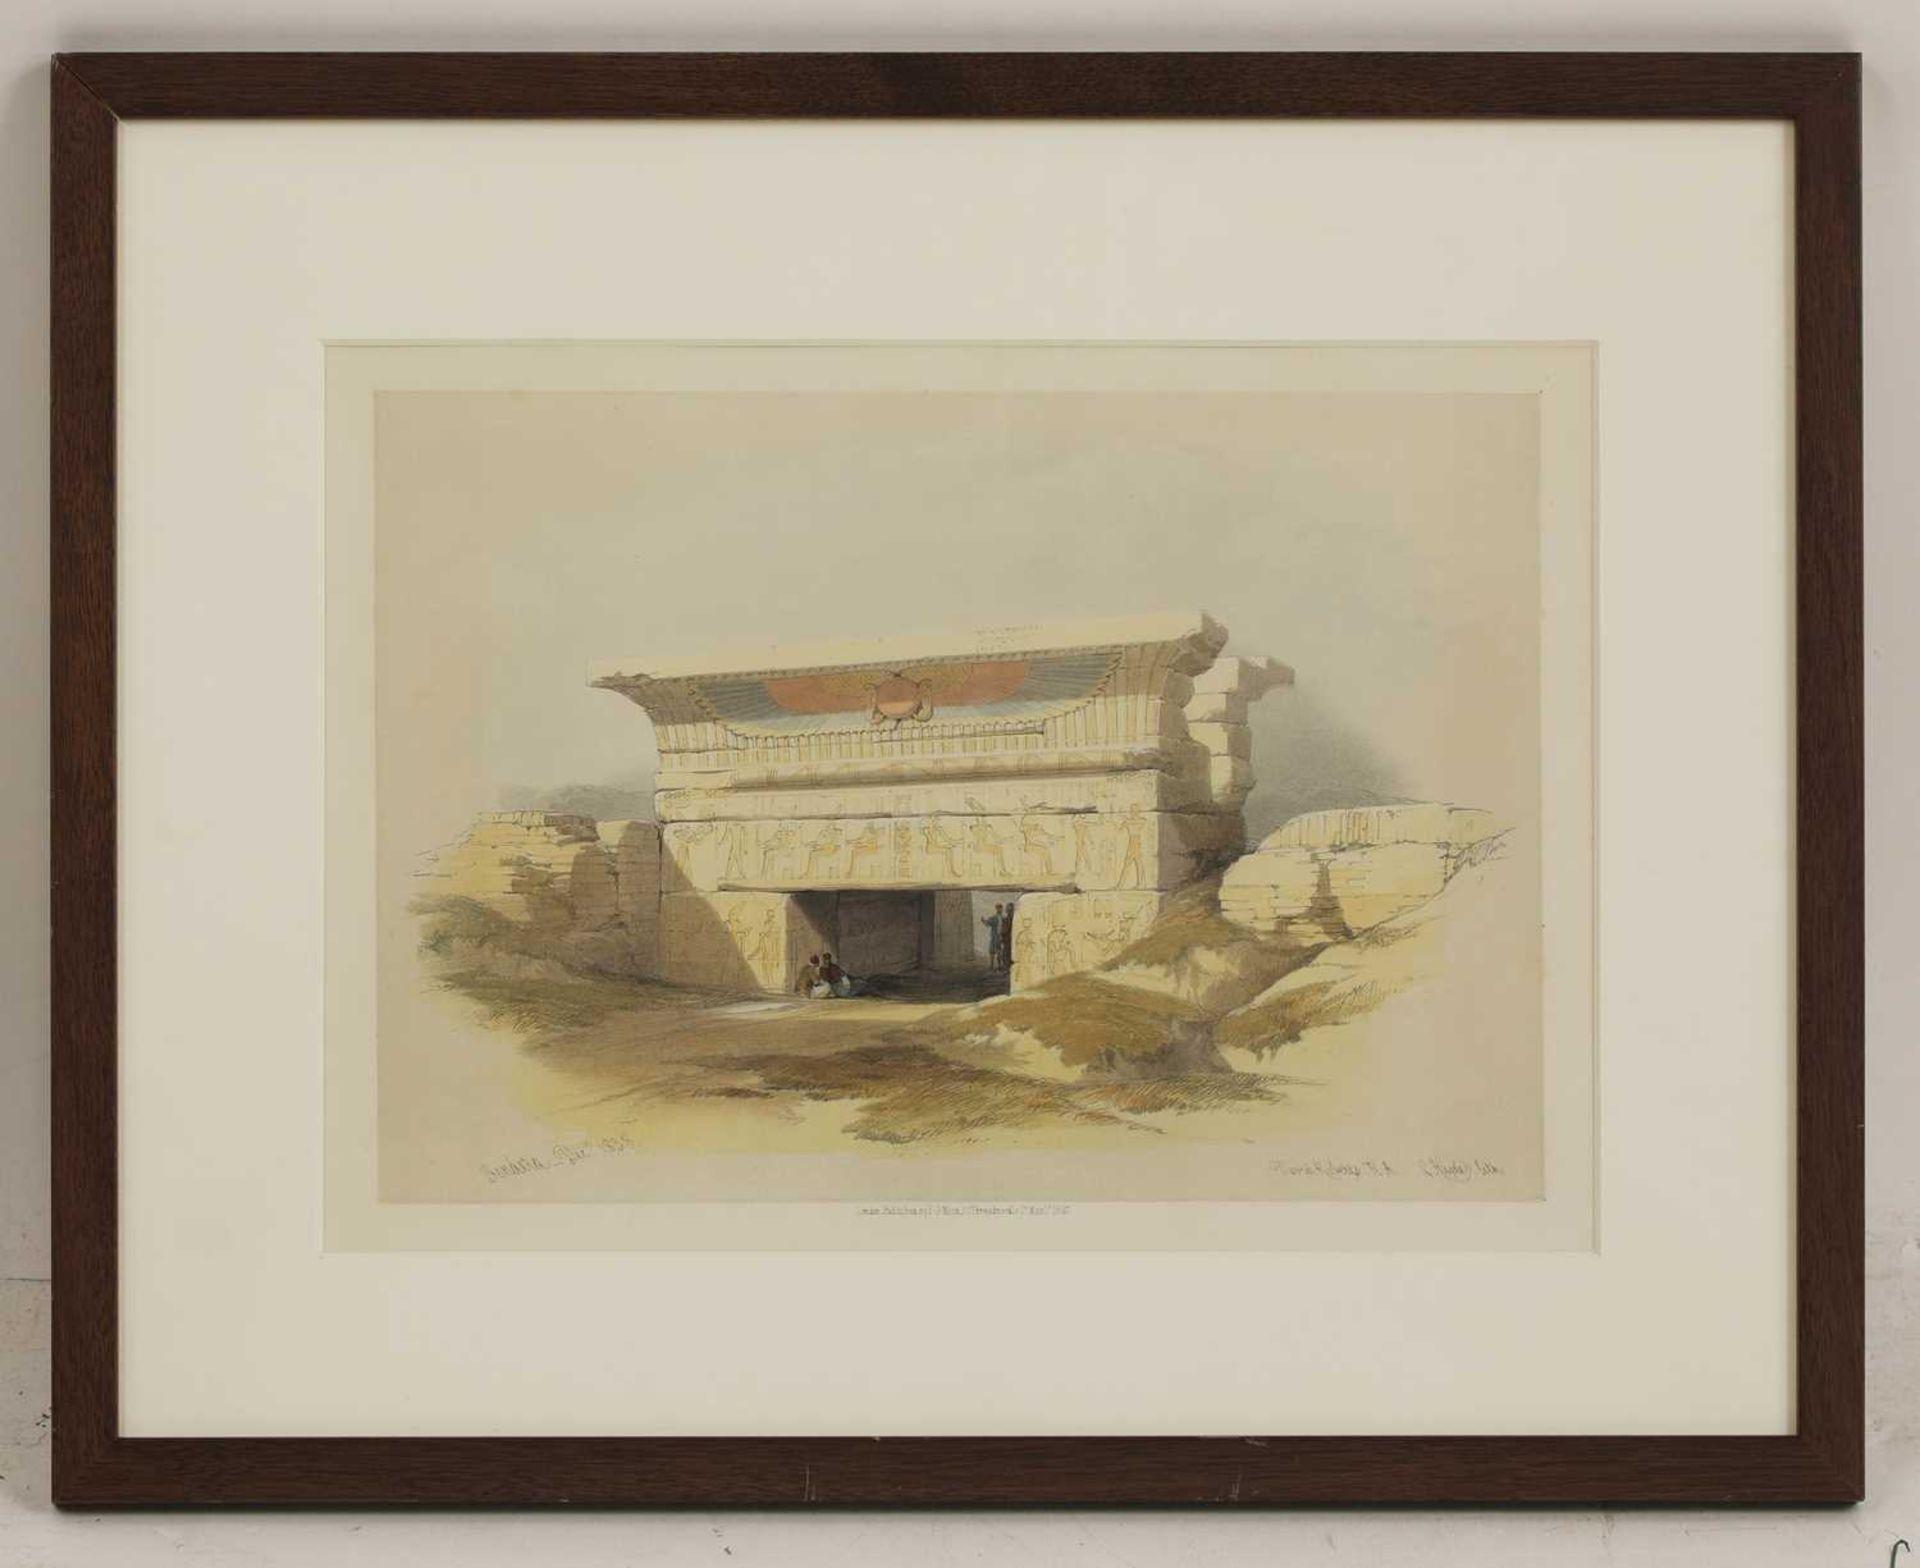 Louis Haghe after David Roberts RA (1796-1864) - Image 20 of 20